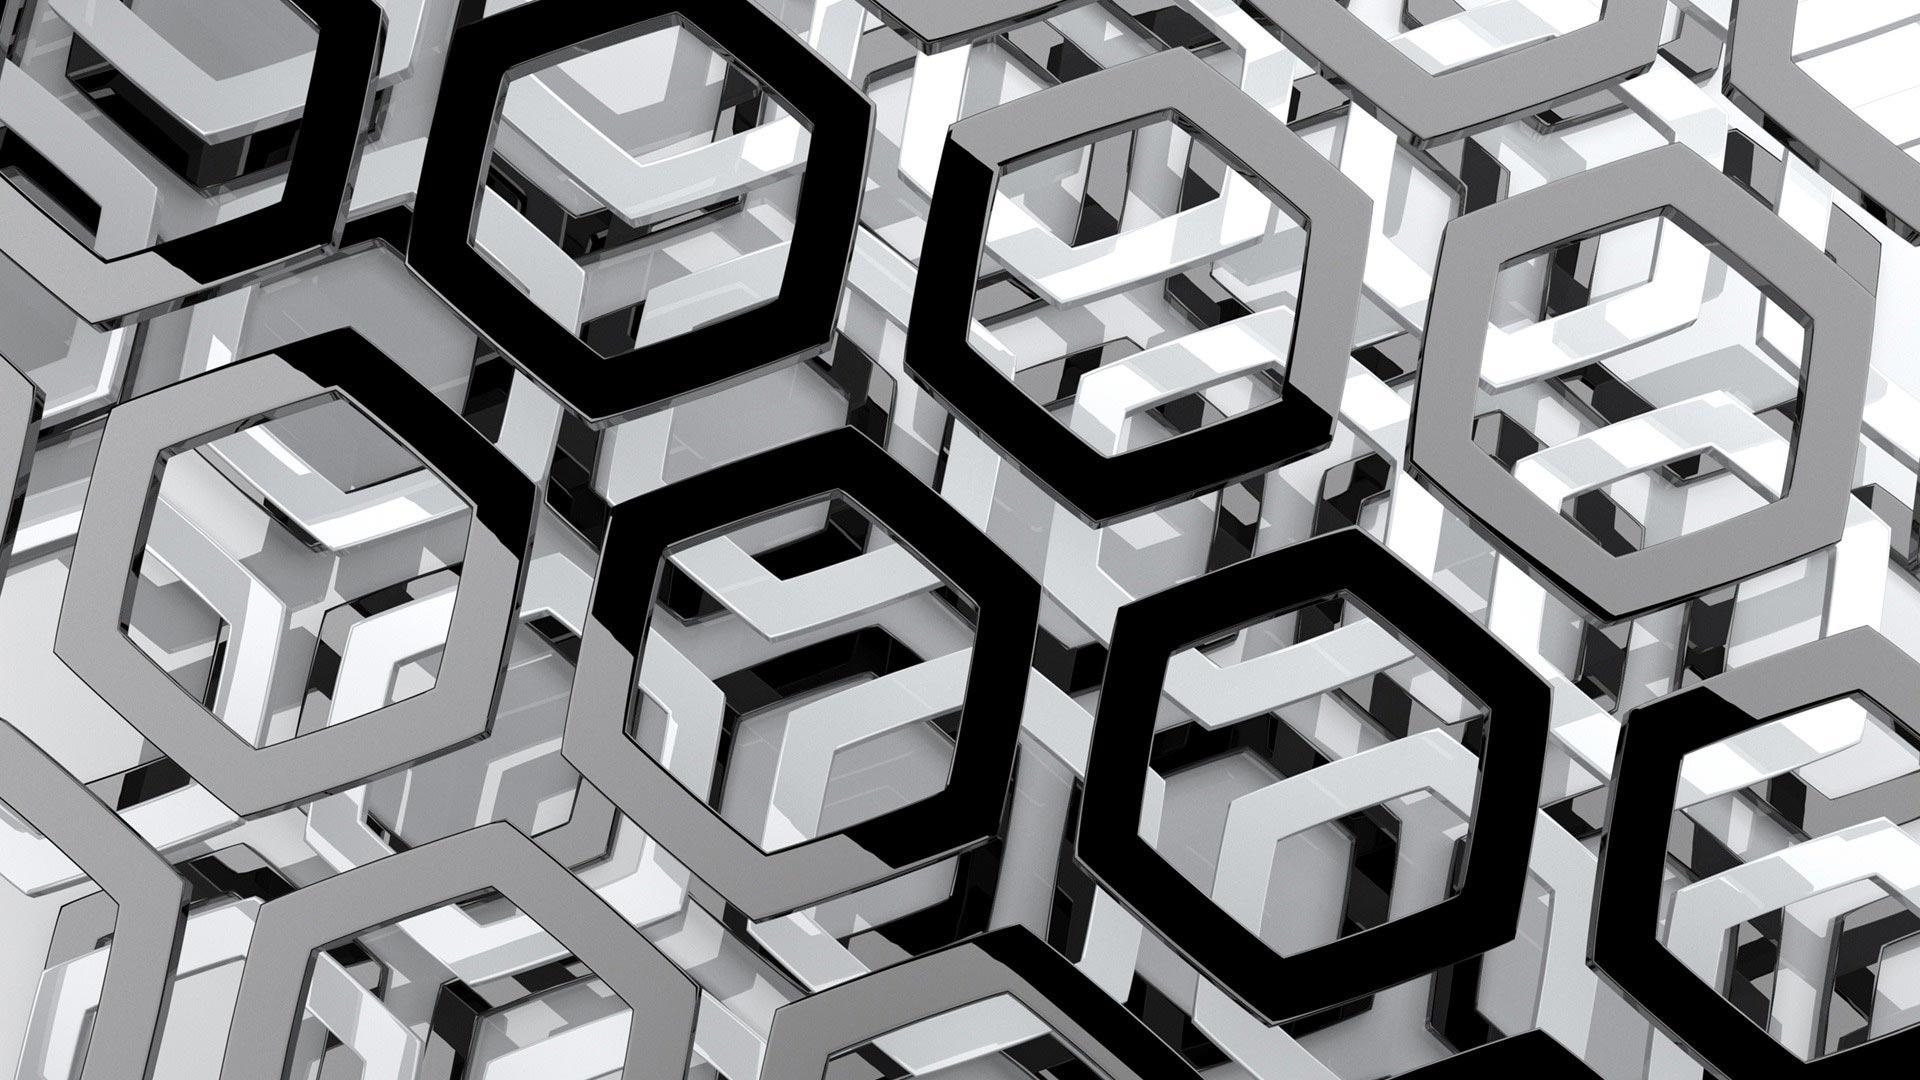 3d hexagon pattern stock vector image 54997696 - 3d Hexagon Pattern Stock Vector Image 54997696 38